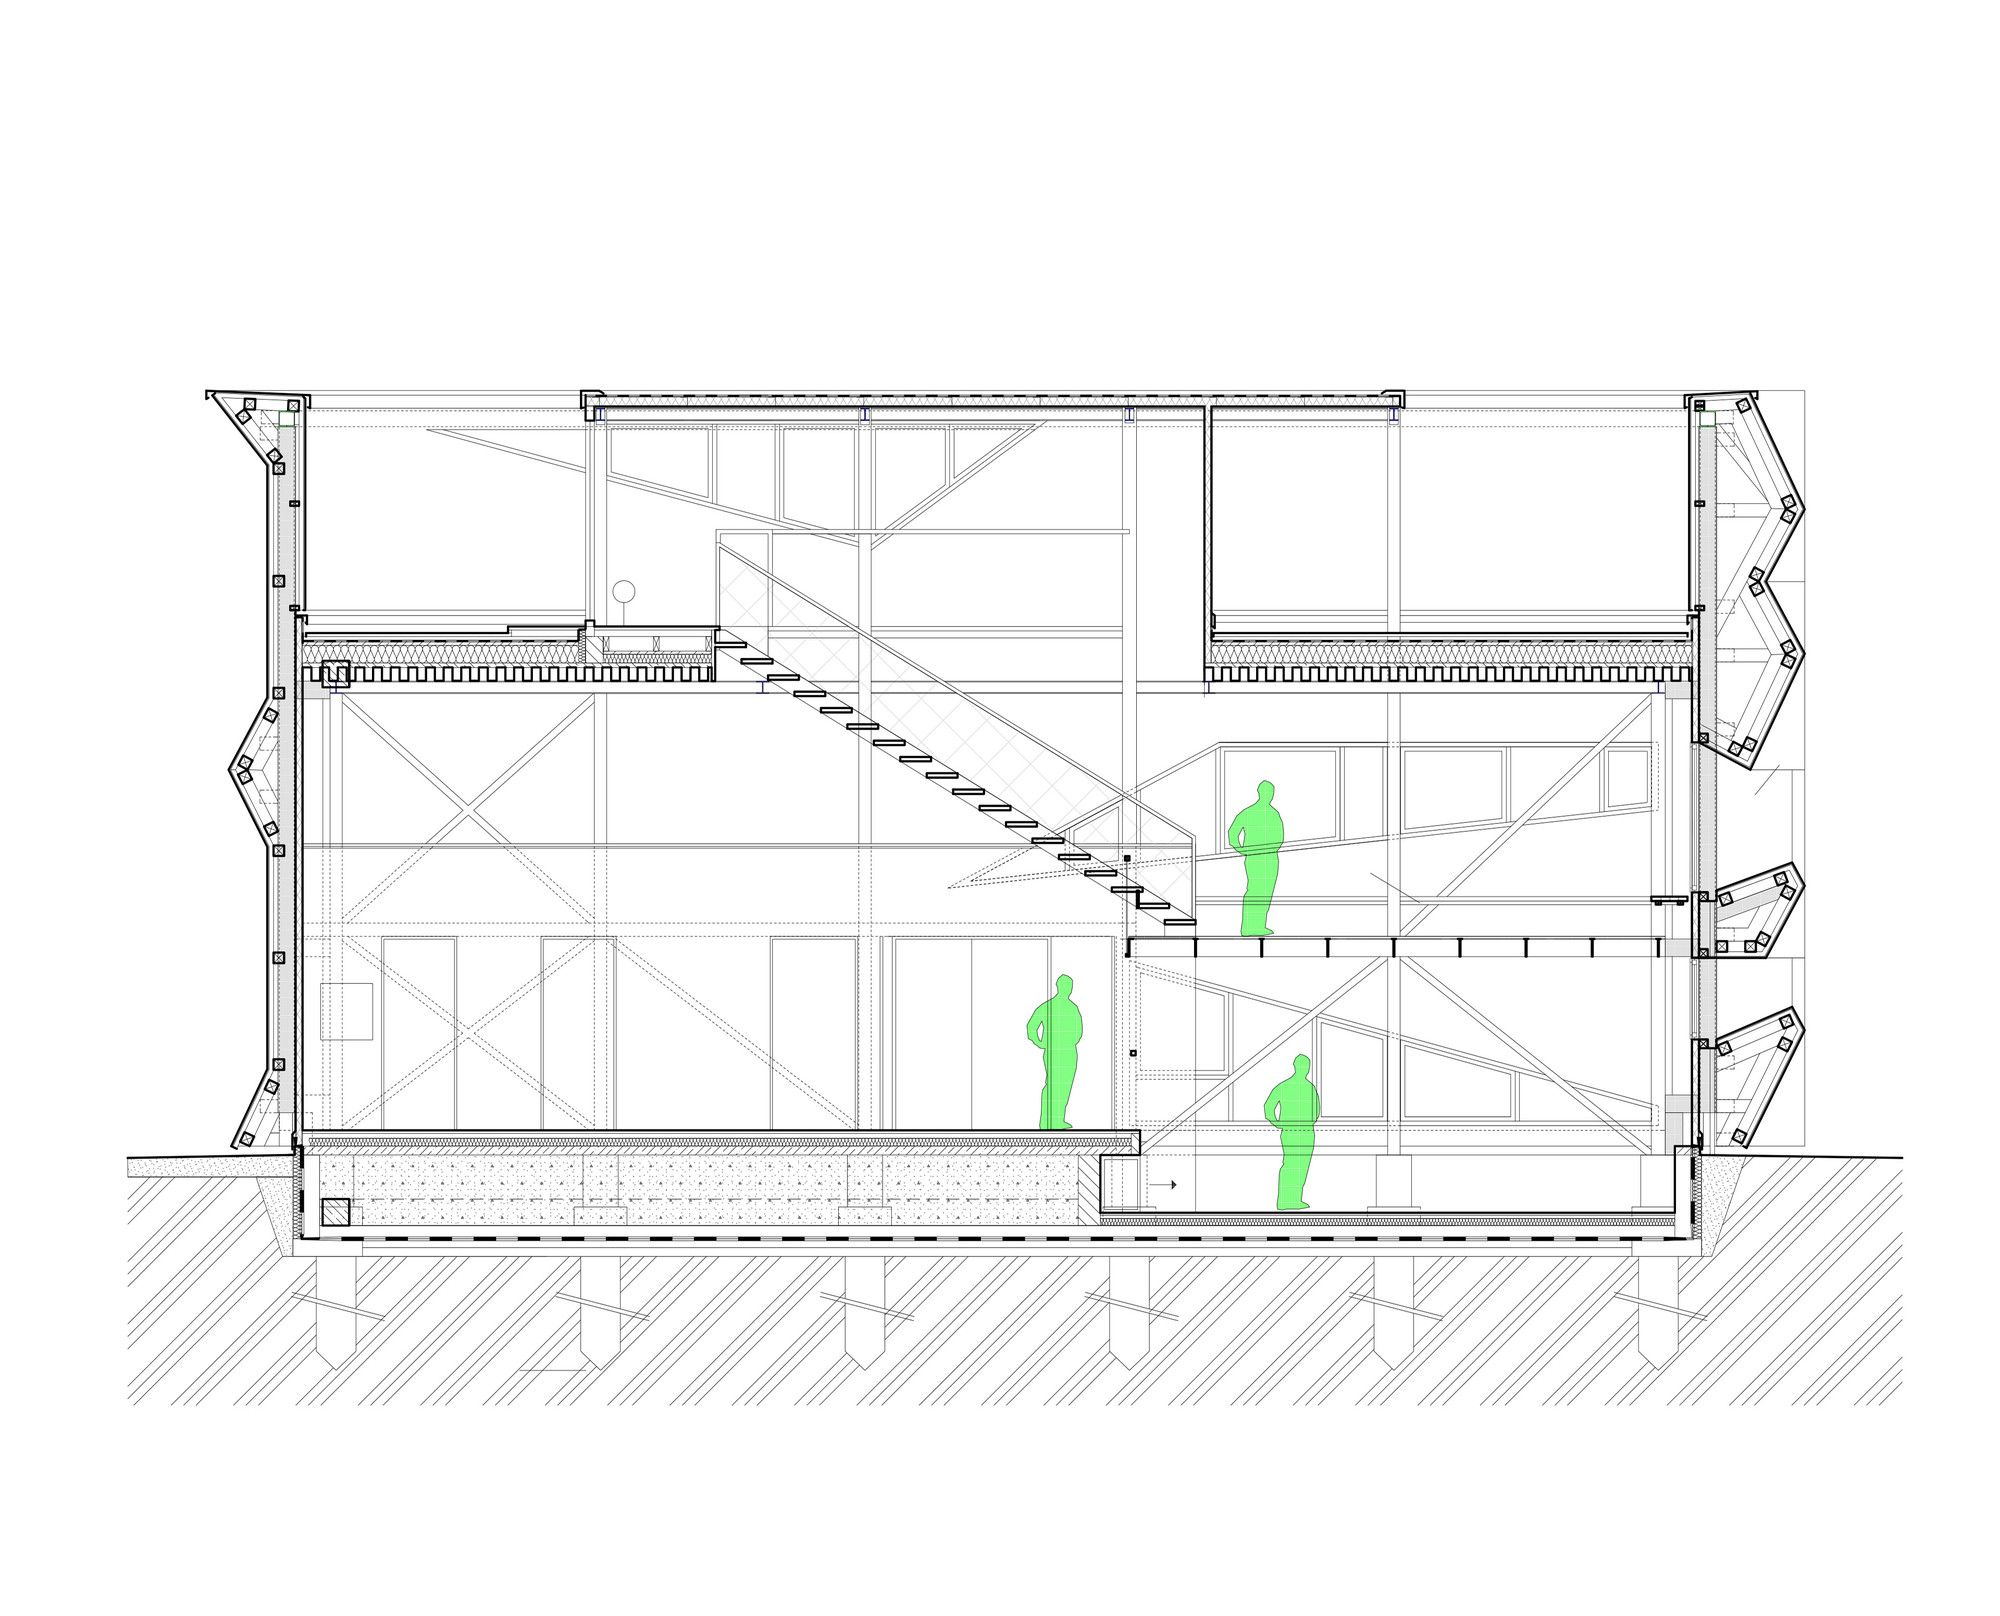 medium resolution of heat exchanger va eck section